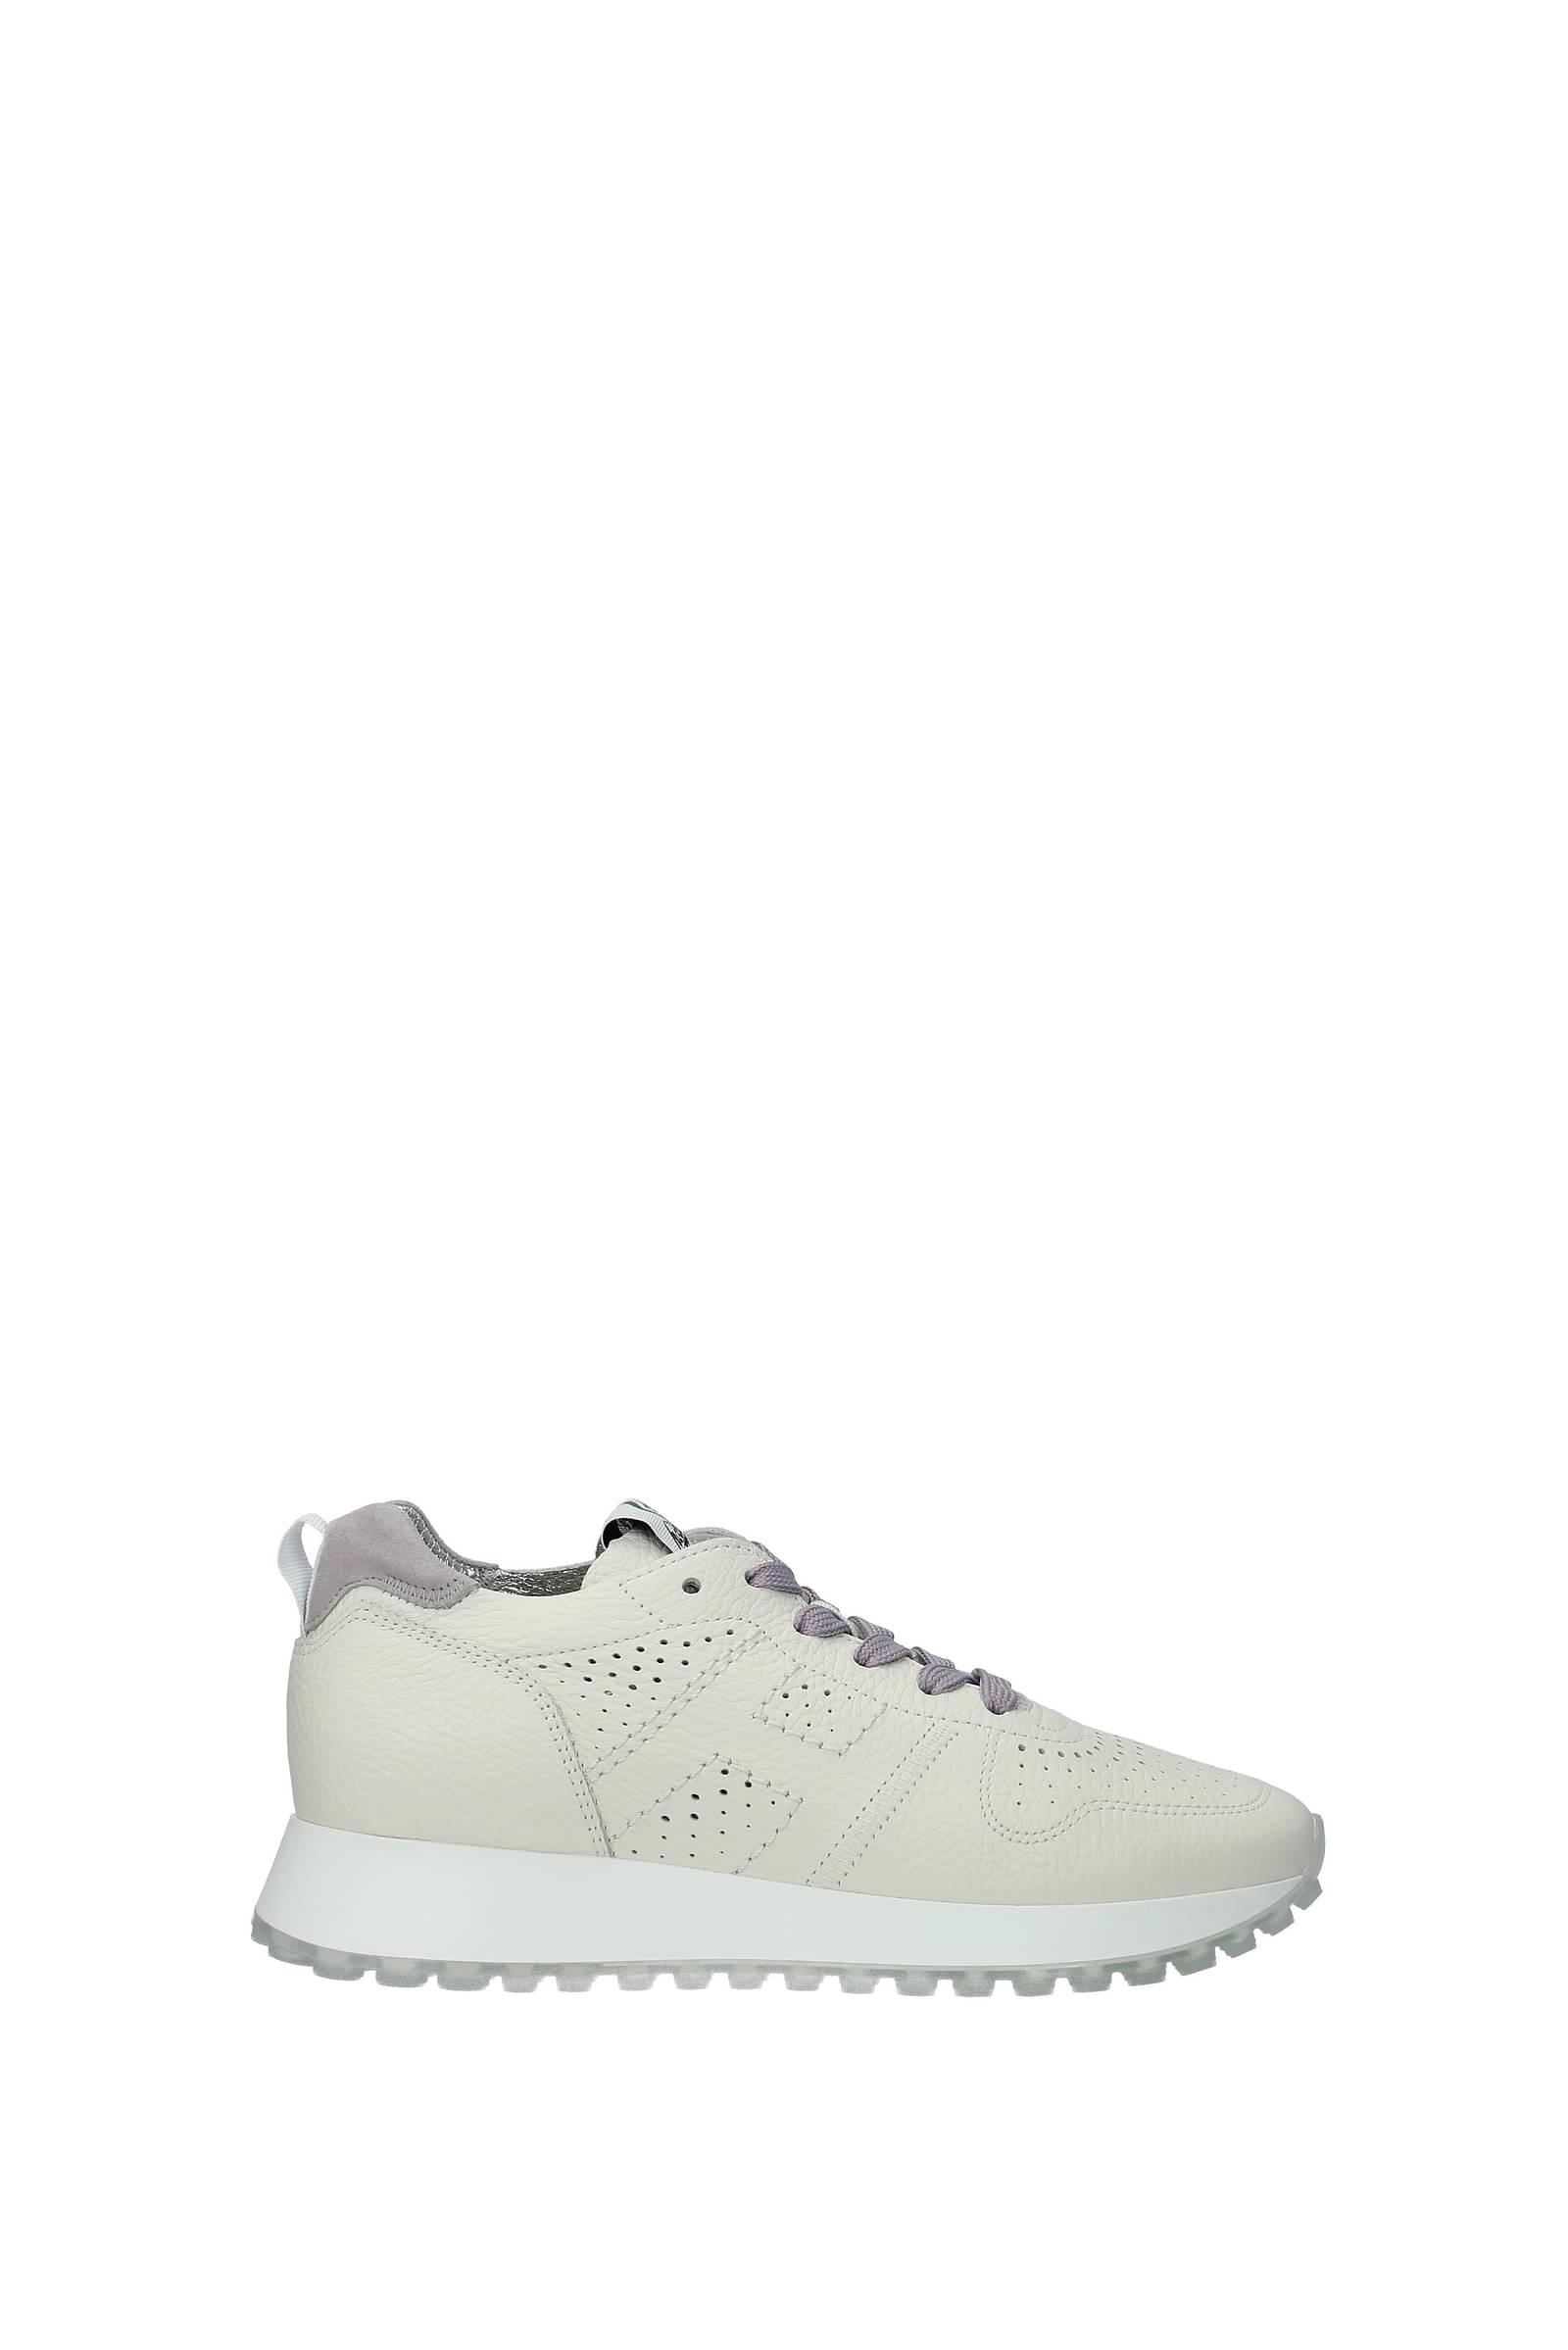 Hogan Sneakers h429 Donna Pelle Beige Arenaria